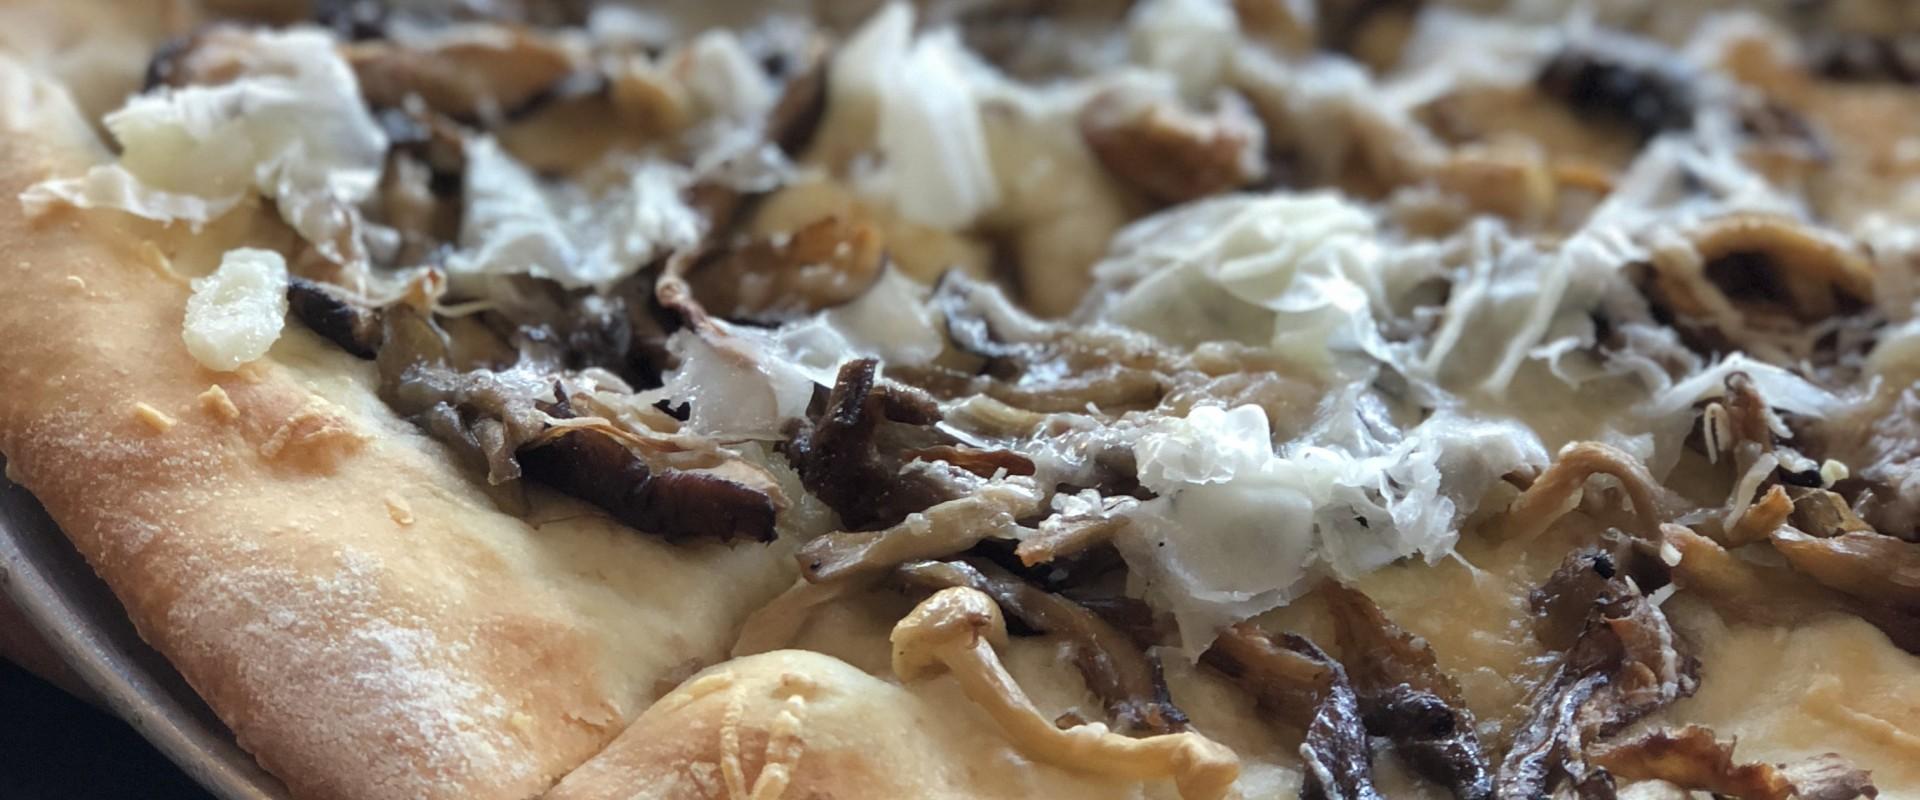 Pizzevino Takeout Funghi En